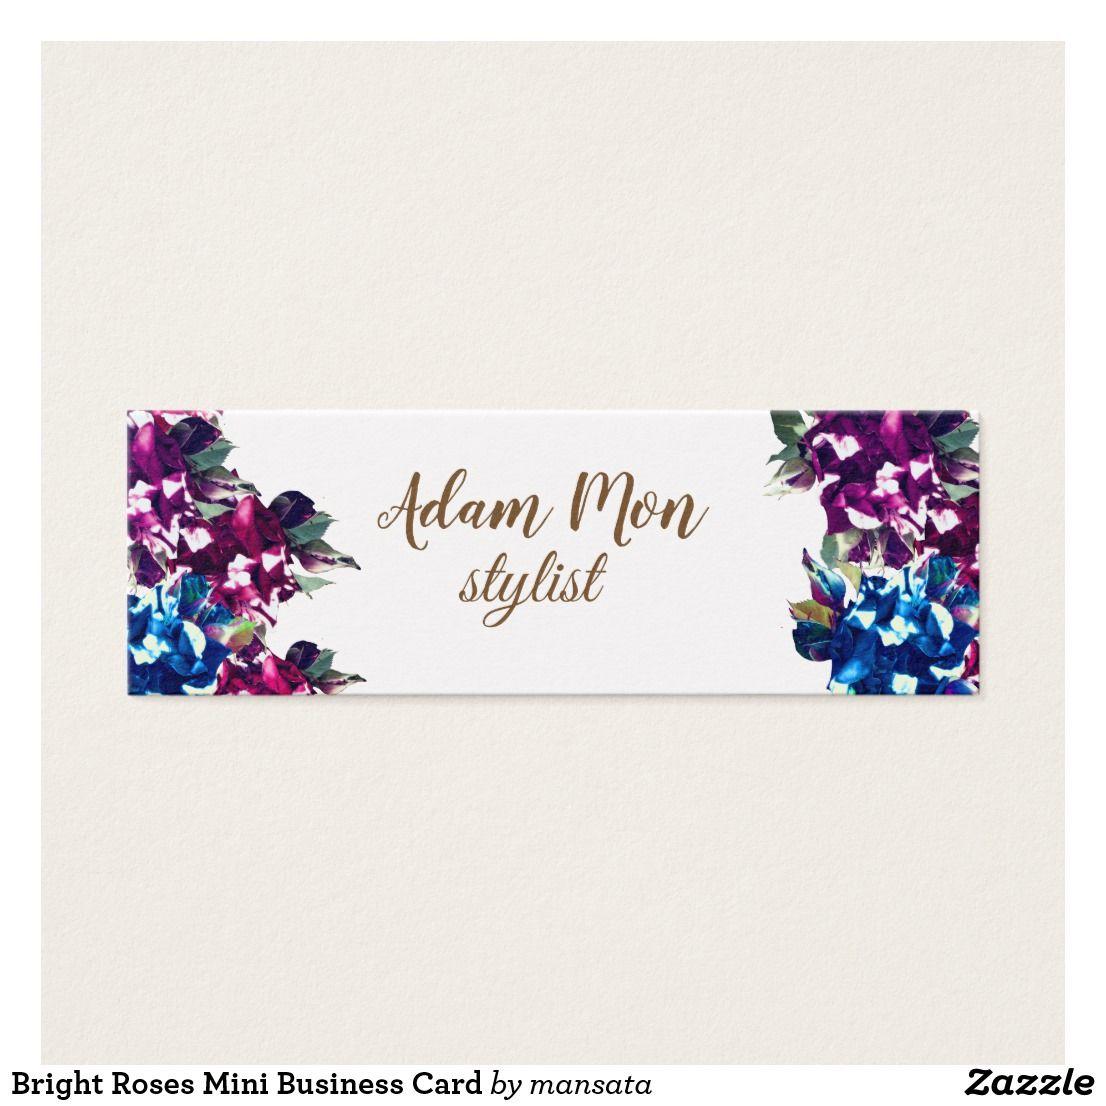 Bright Roses Mini Business Card Zazzle Co Uk Mini Business Card Floral Business Cards Unique Business Cards